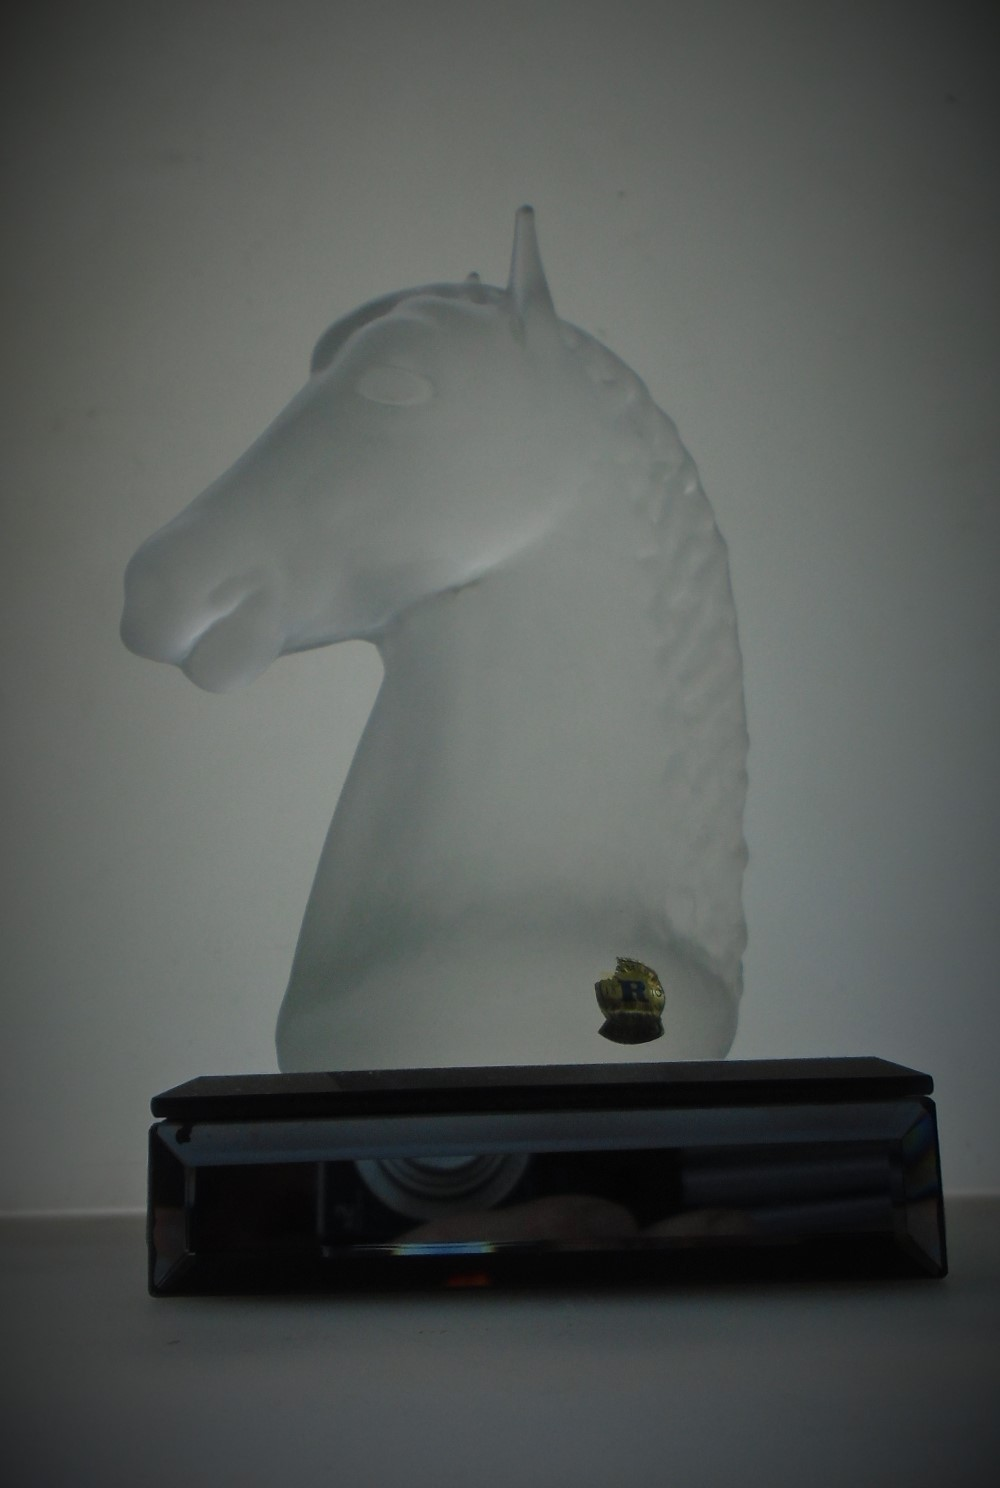 Late 20th century Vintage Crystal Glass Horse Head Figurine from Swedish Glass maker Reijmyre.